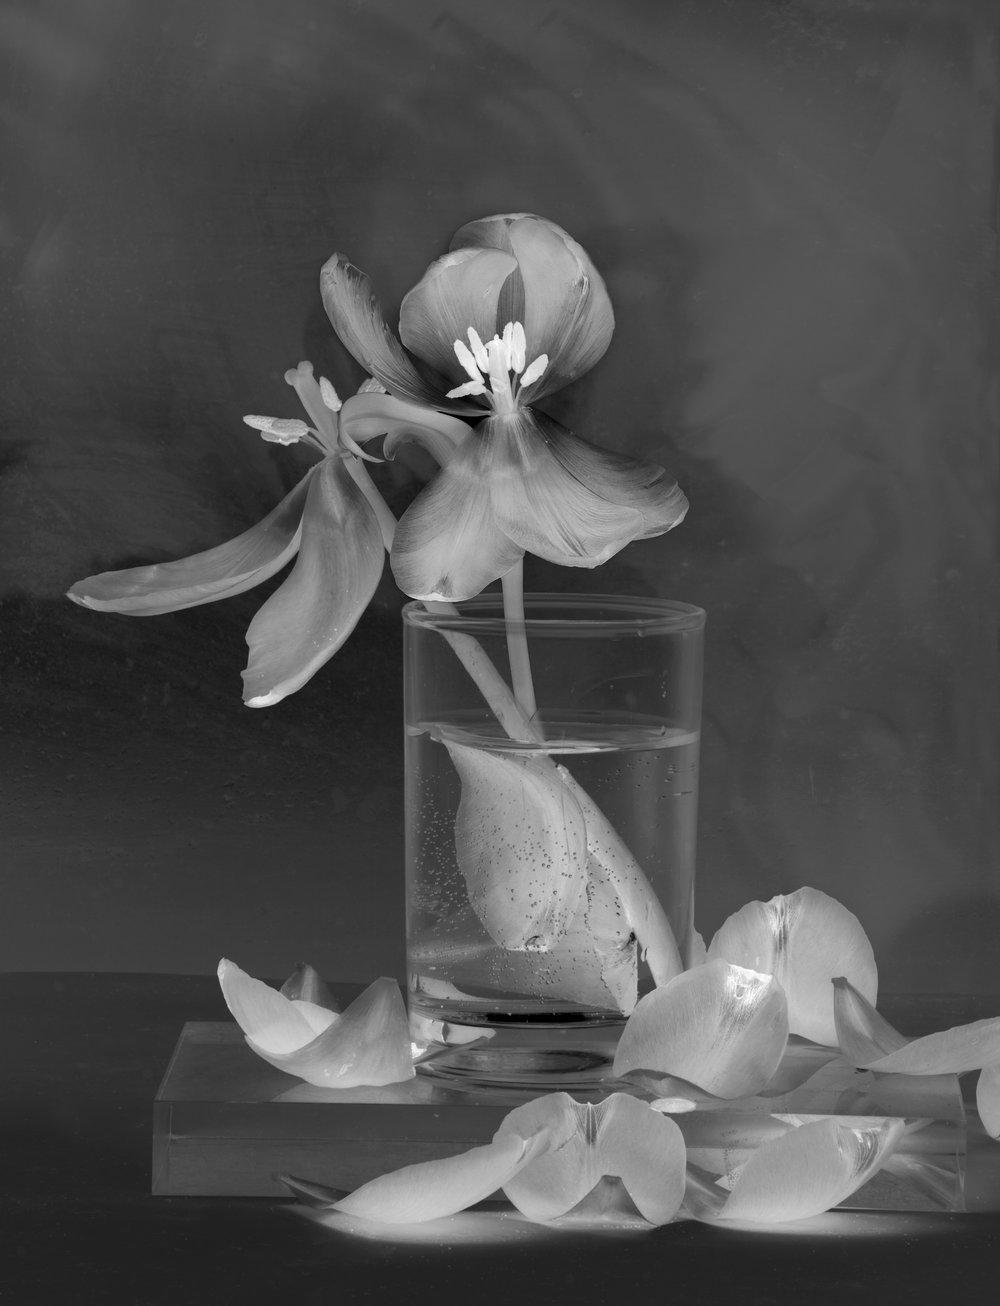 Flower : Tulip 14inv. 2017